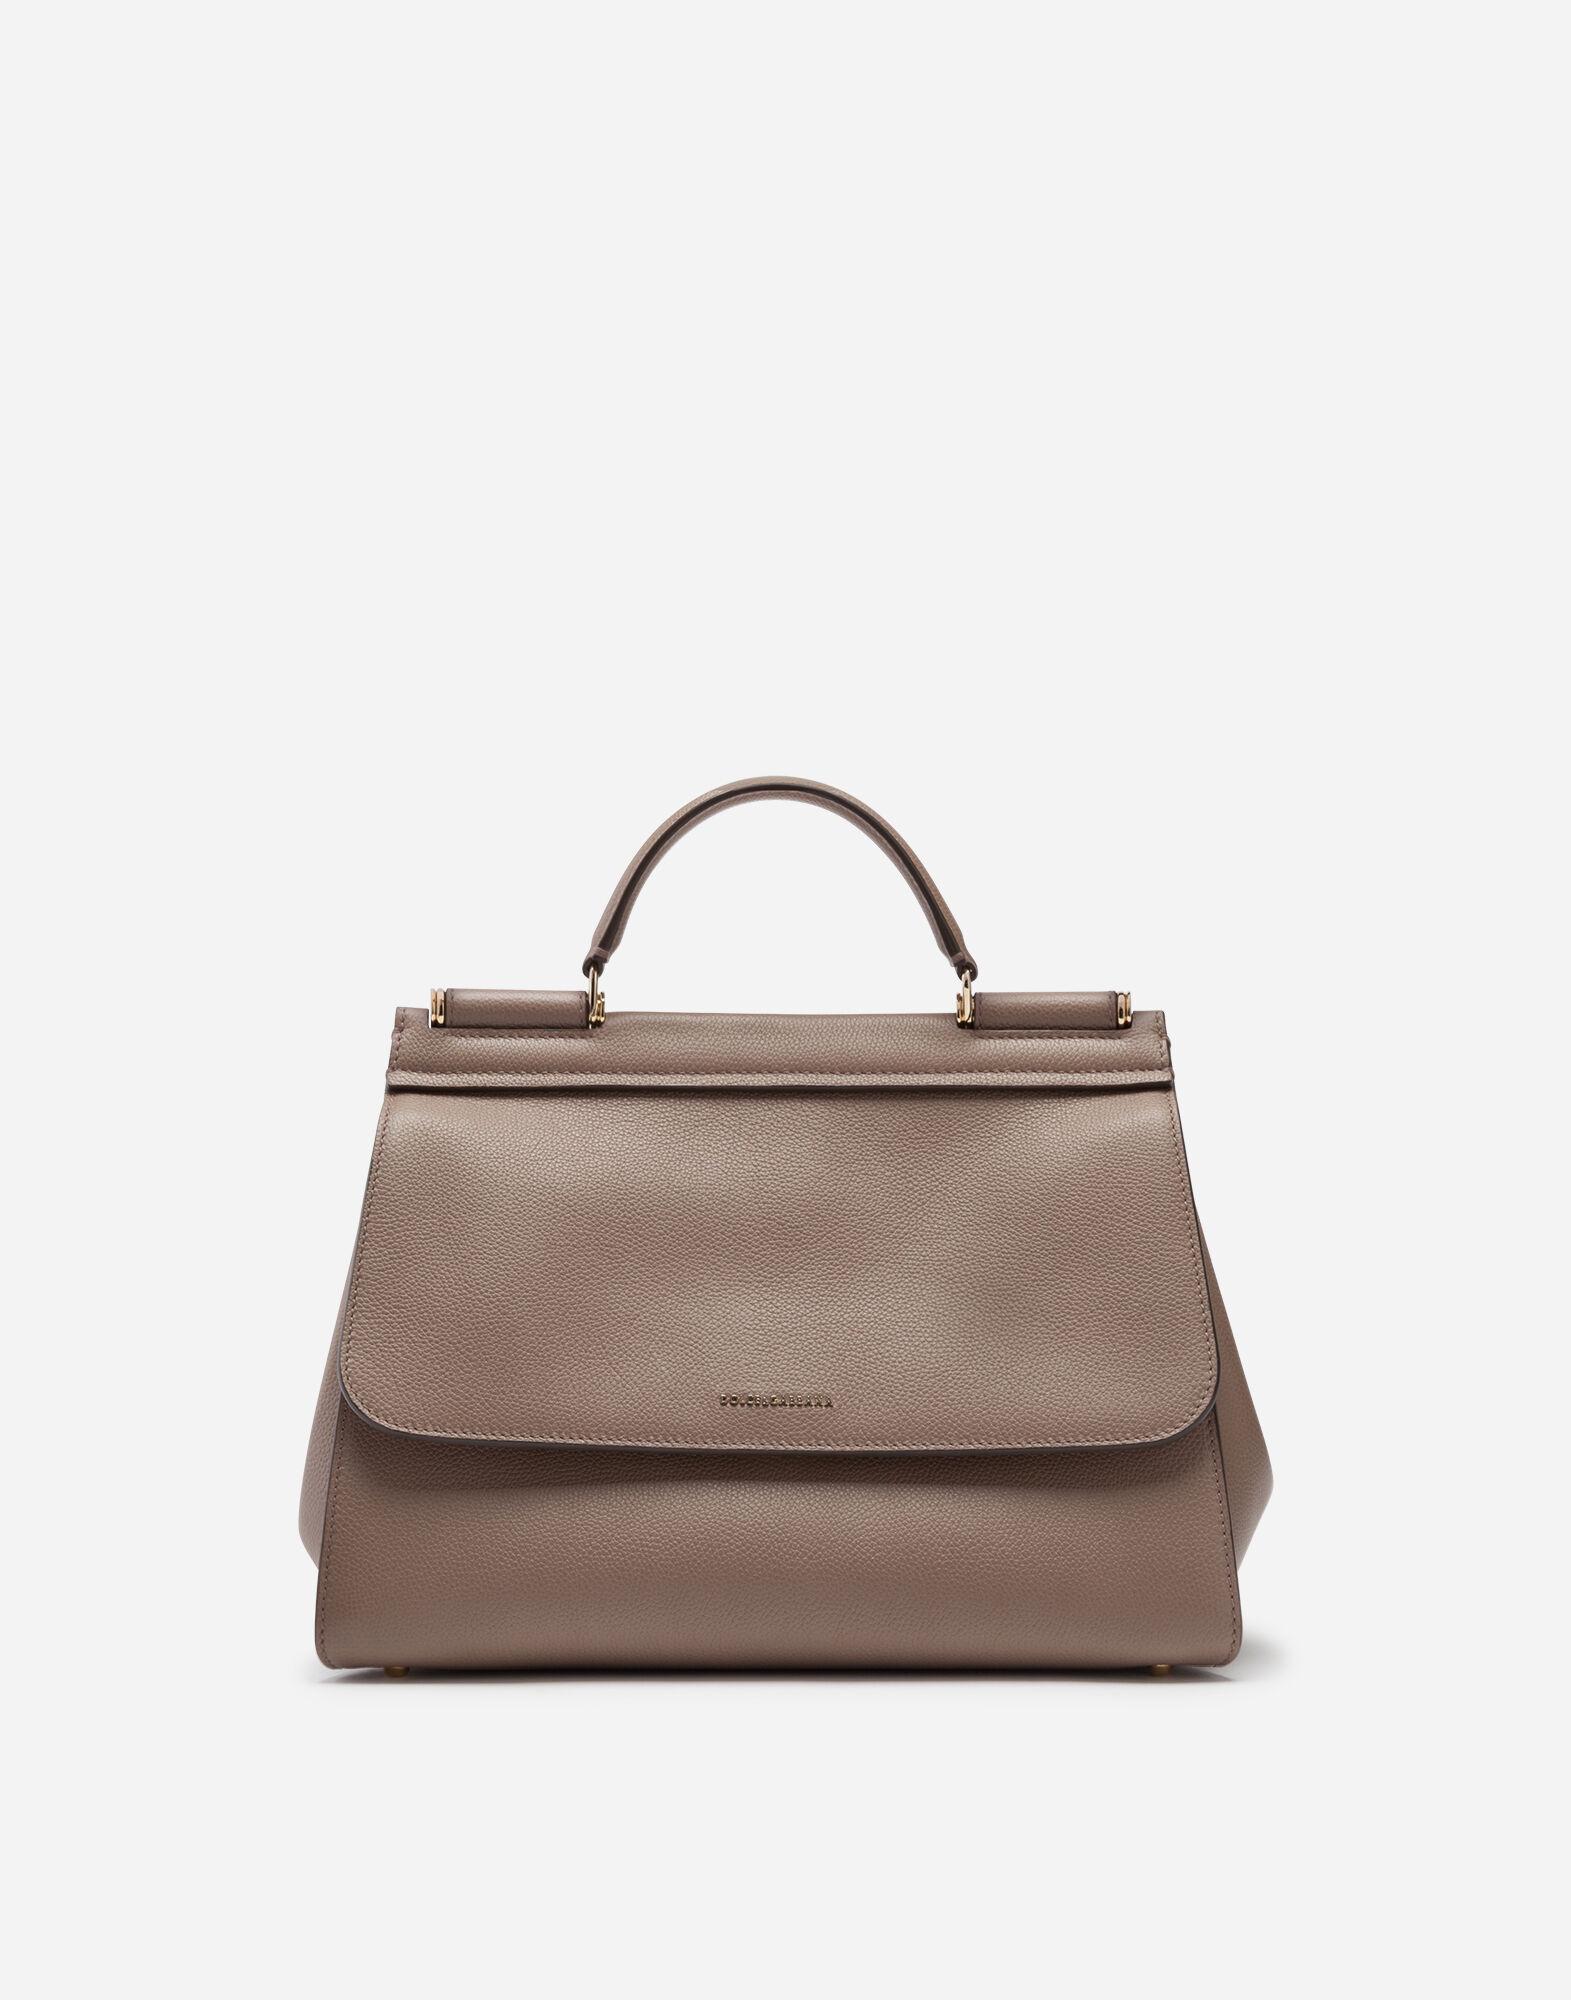 WomenDolce Bag amp;gabbana For Sicily Collection qzSUVMp